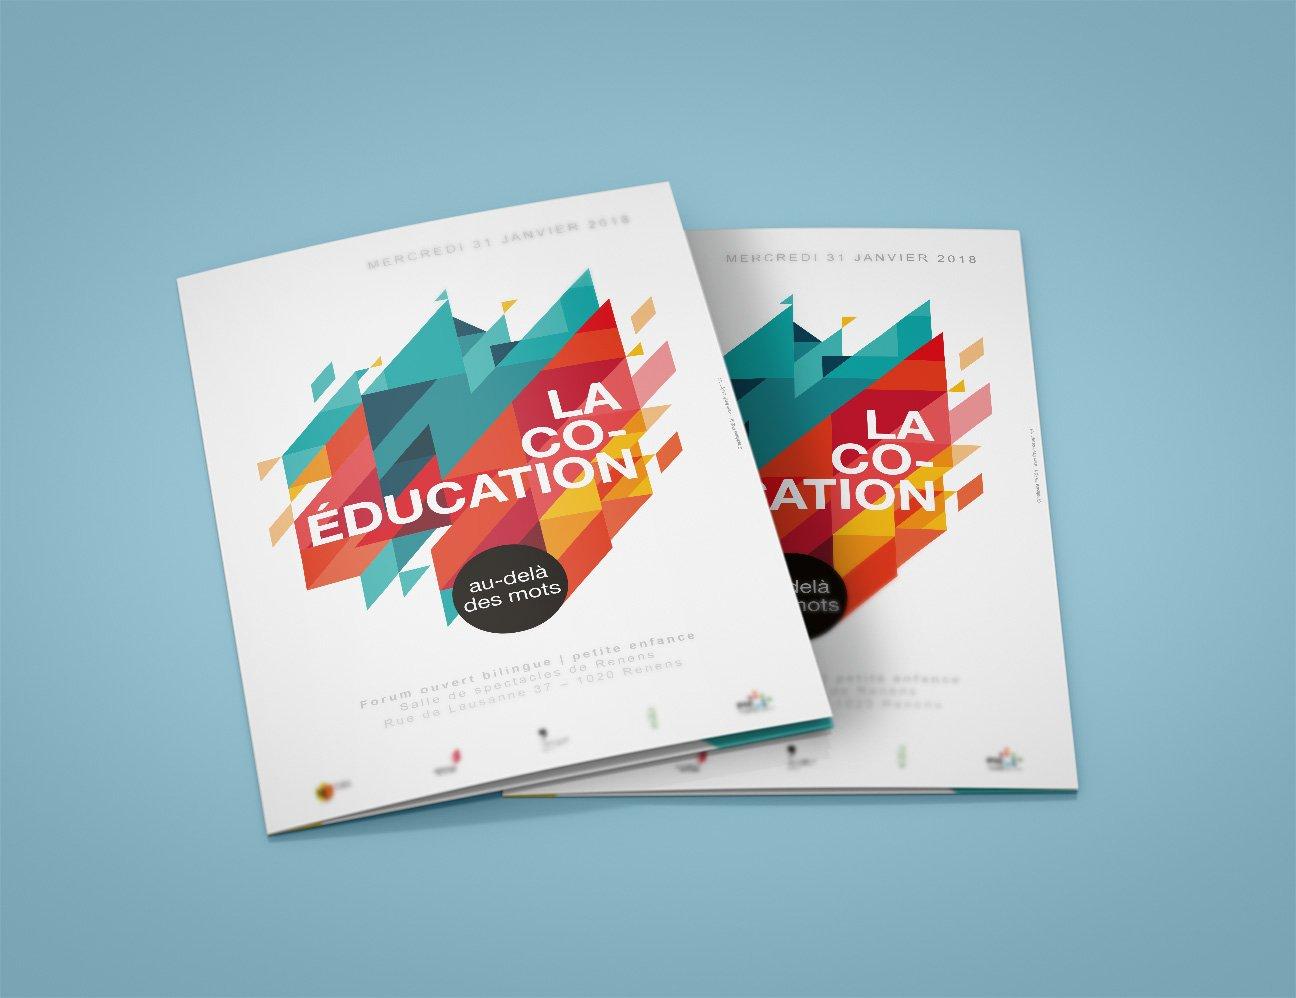 Fabien_Cuffel_Etat_Geneve_Coeducation_Leaflet